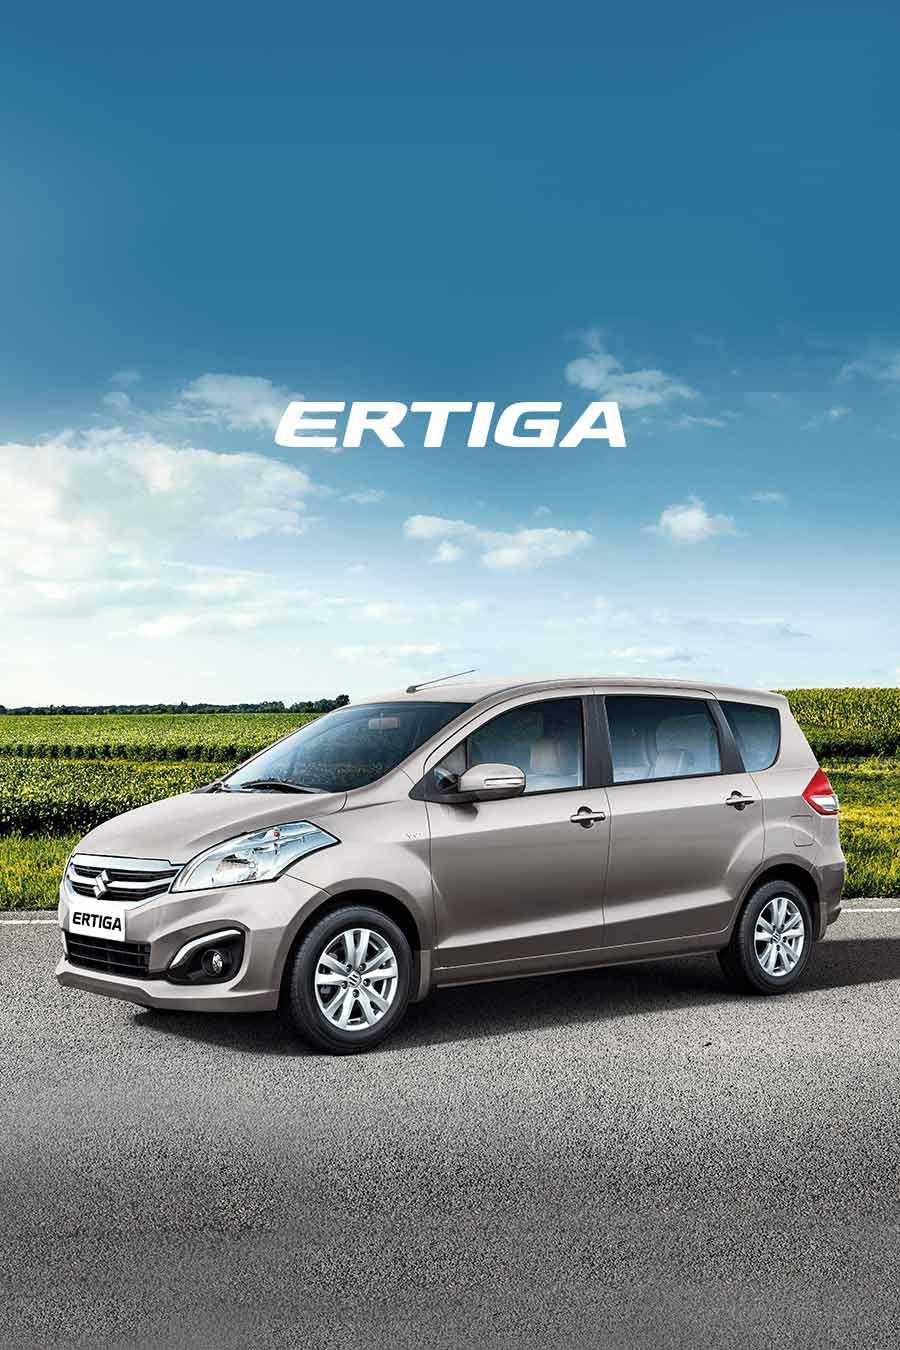 Suzuki-Ertiga-Mobil-01